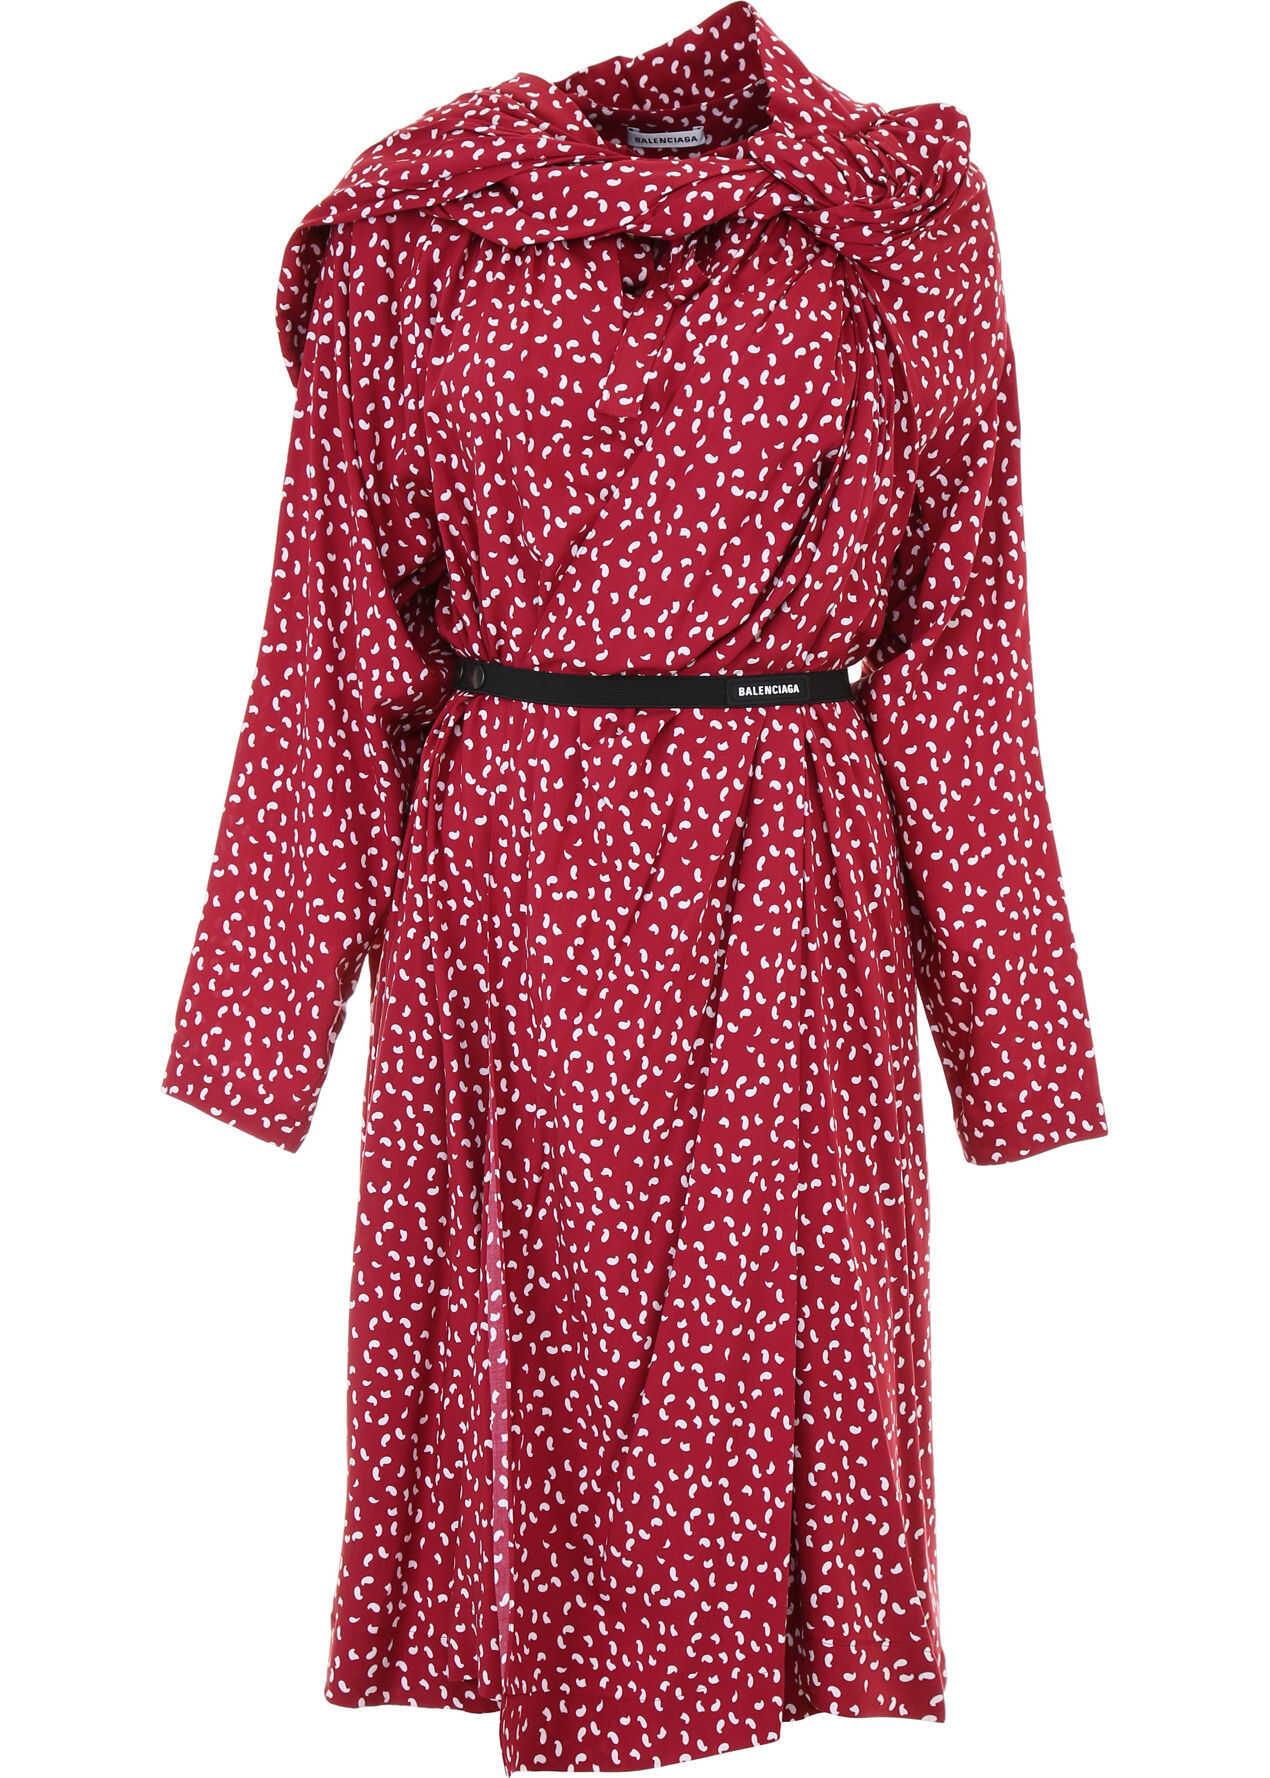 Balenciaga Dress With All-Over Print BORDEAUX